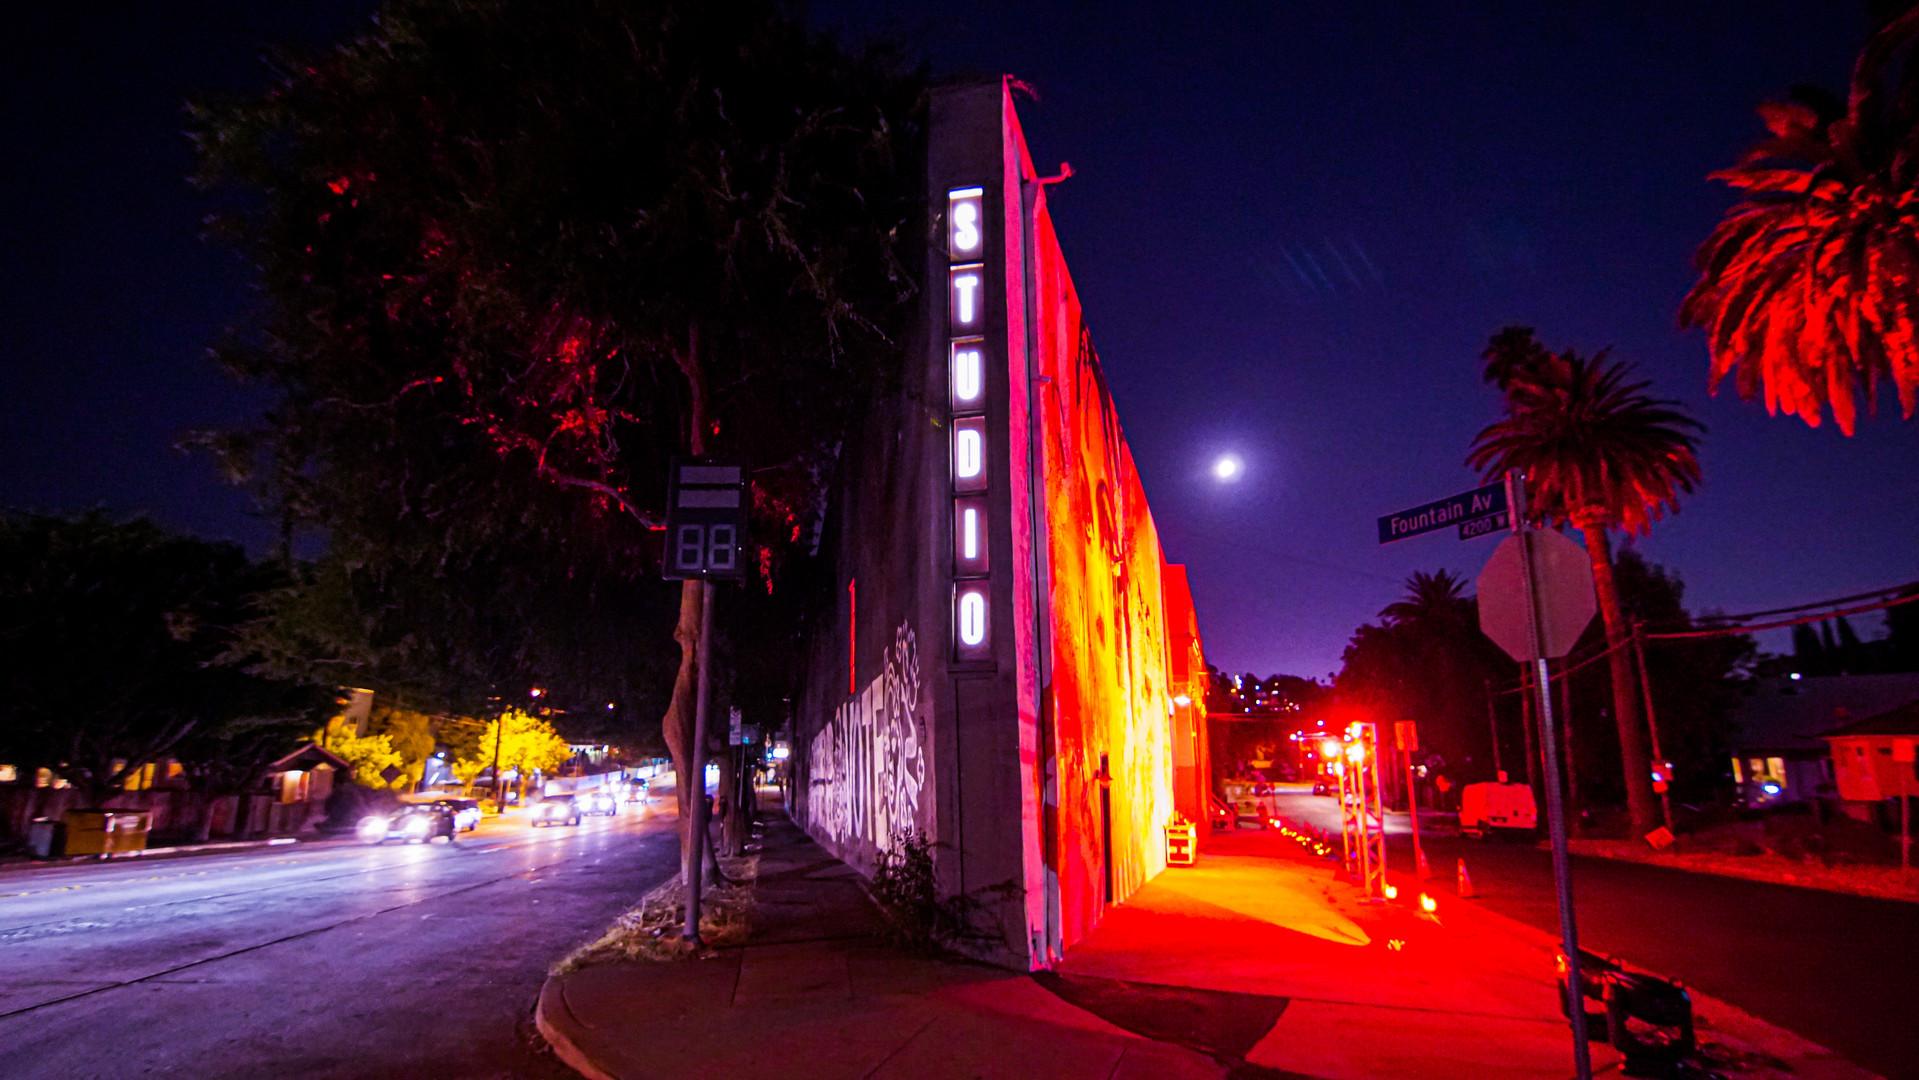 Mack Sennet Studios